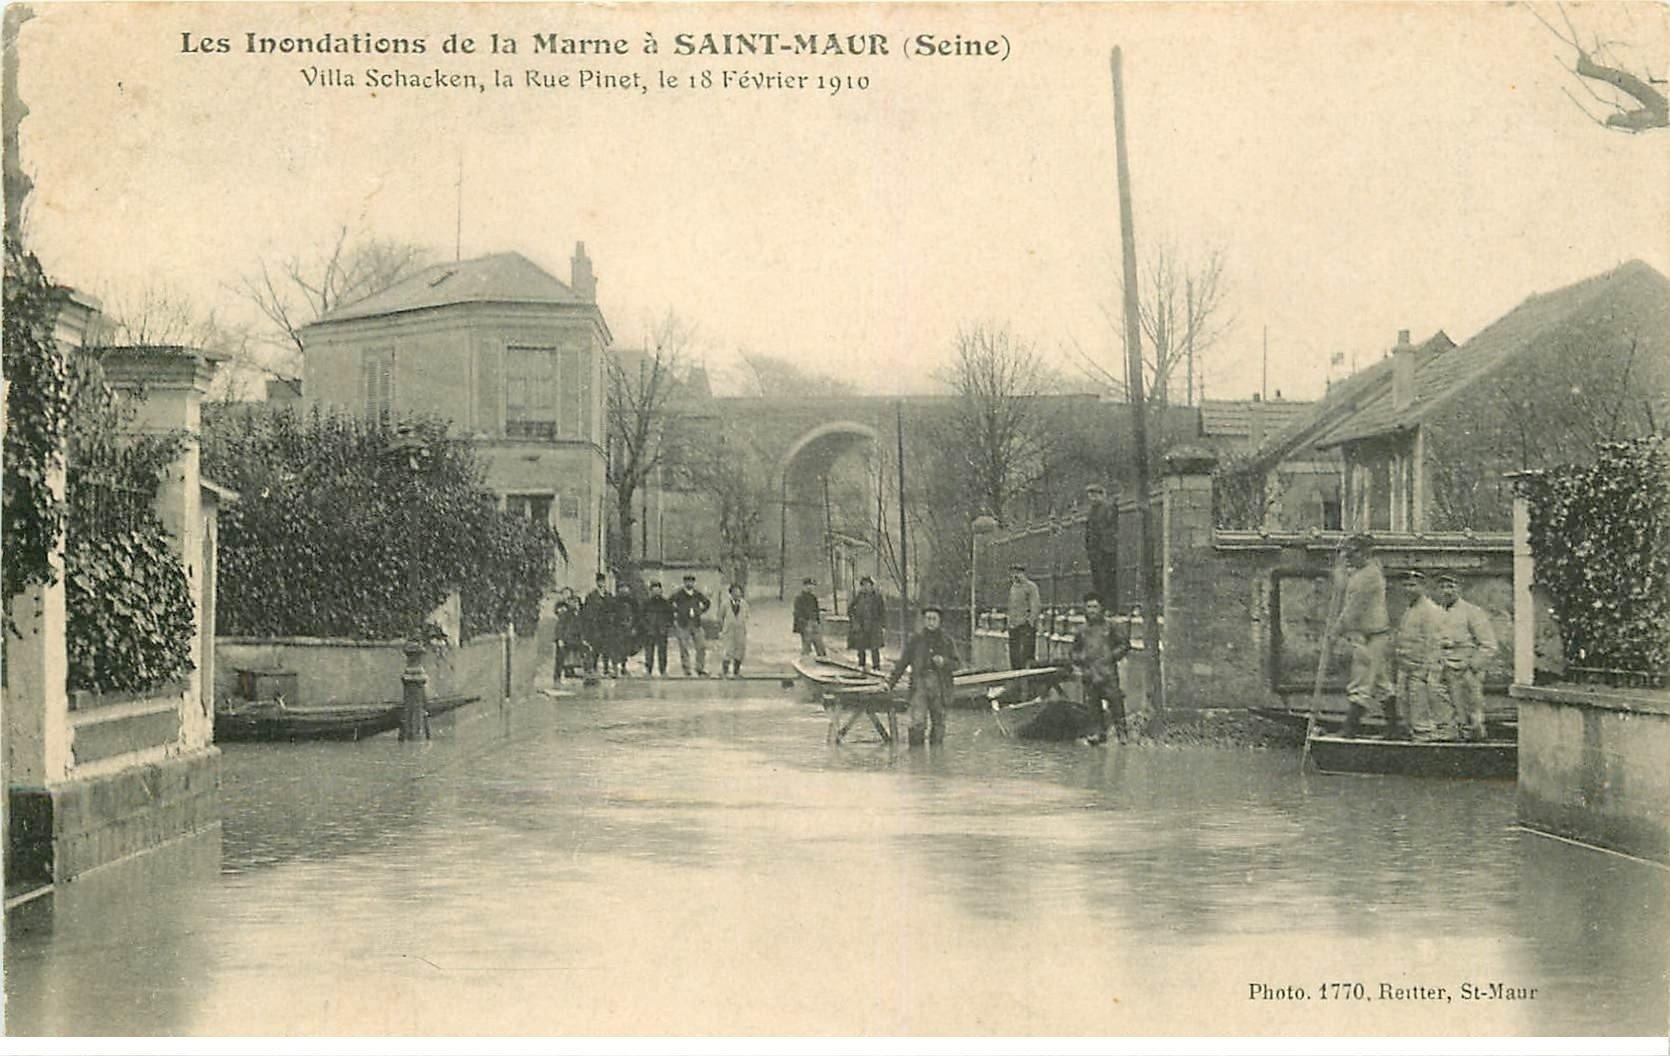 carte postale ancienne Inondation et Crue de 1910. SAINT-MAUR 94. Rue Pinet Villa Schacken